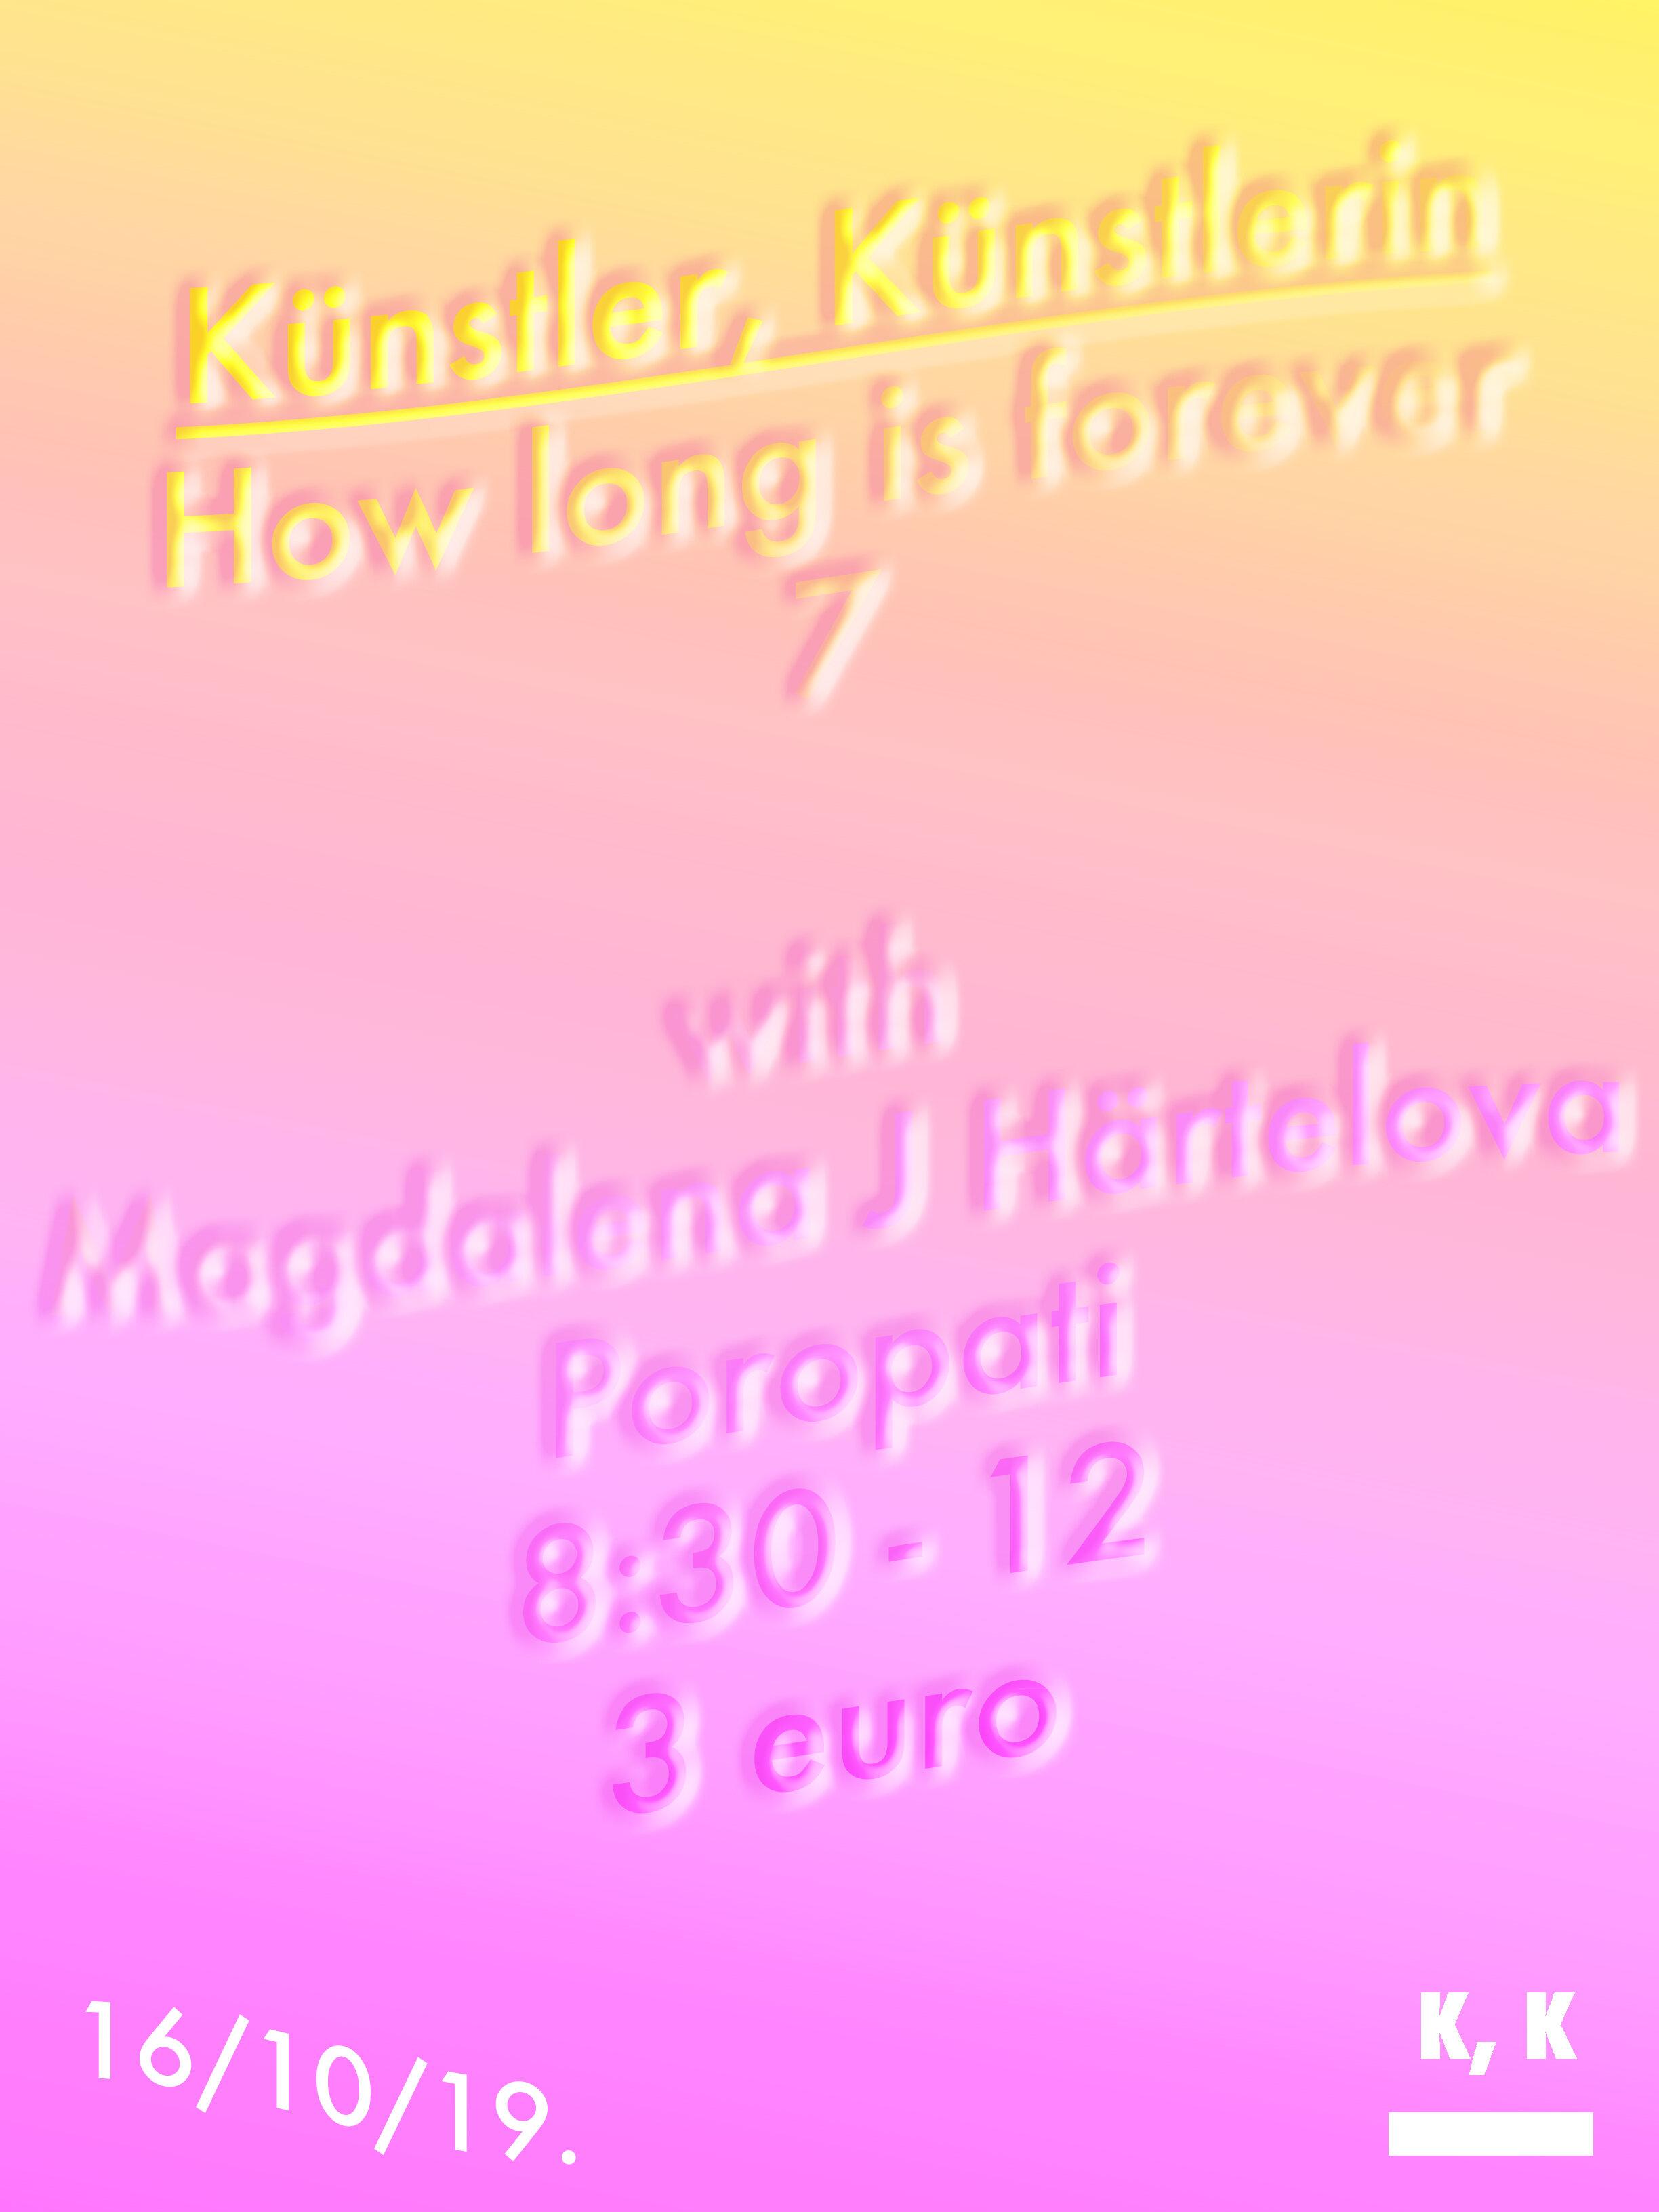 Kunstler, Kunstlerin, How long is forever 7 with Magdalena Jadwiga Härtelova.jpg